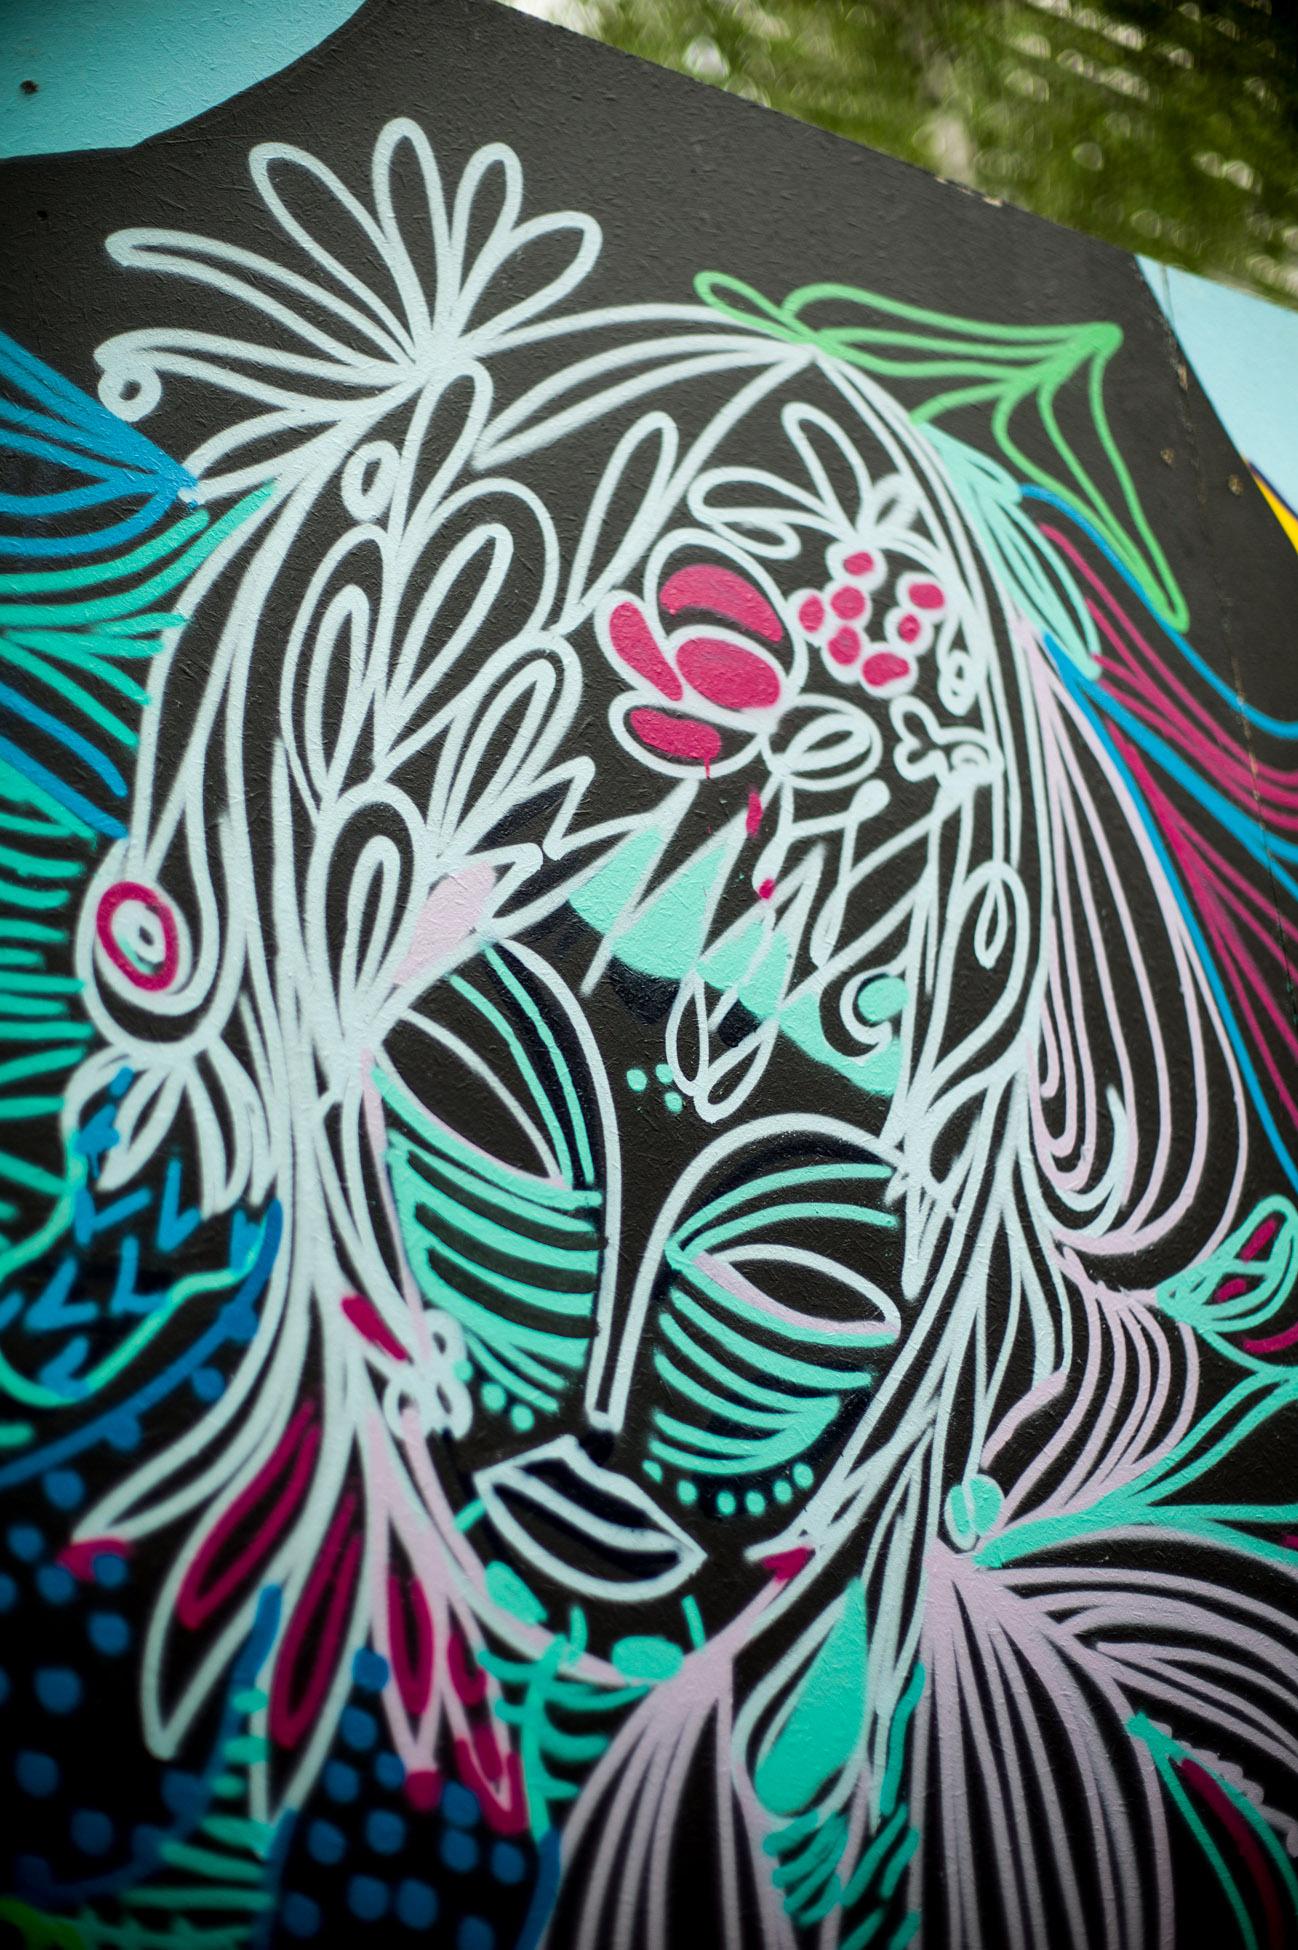 Streetart_Brazil_Rimon guimaraes_2013_Frankfurt (15 von 15)